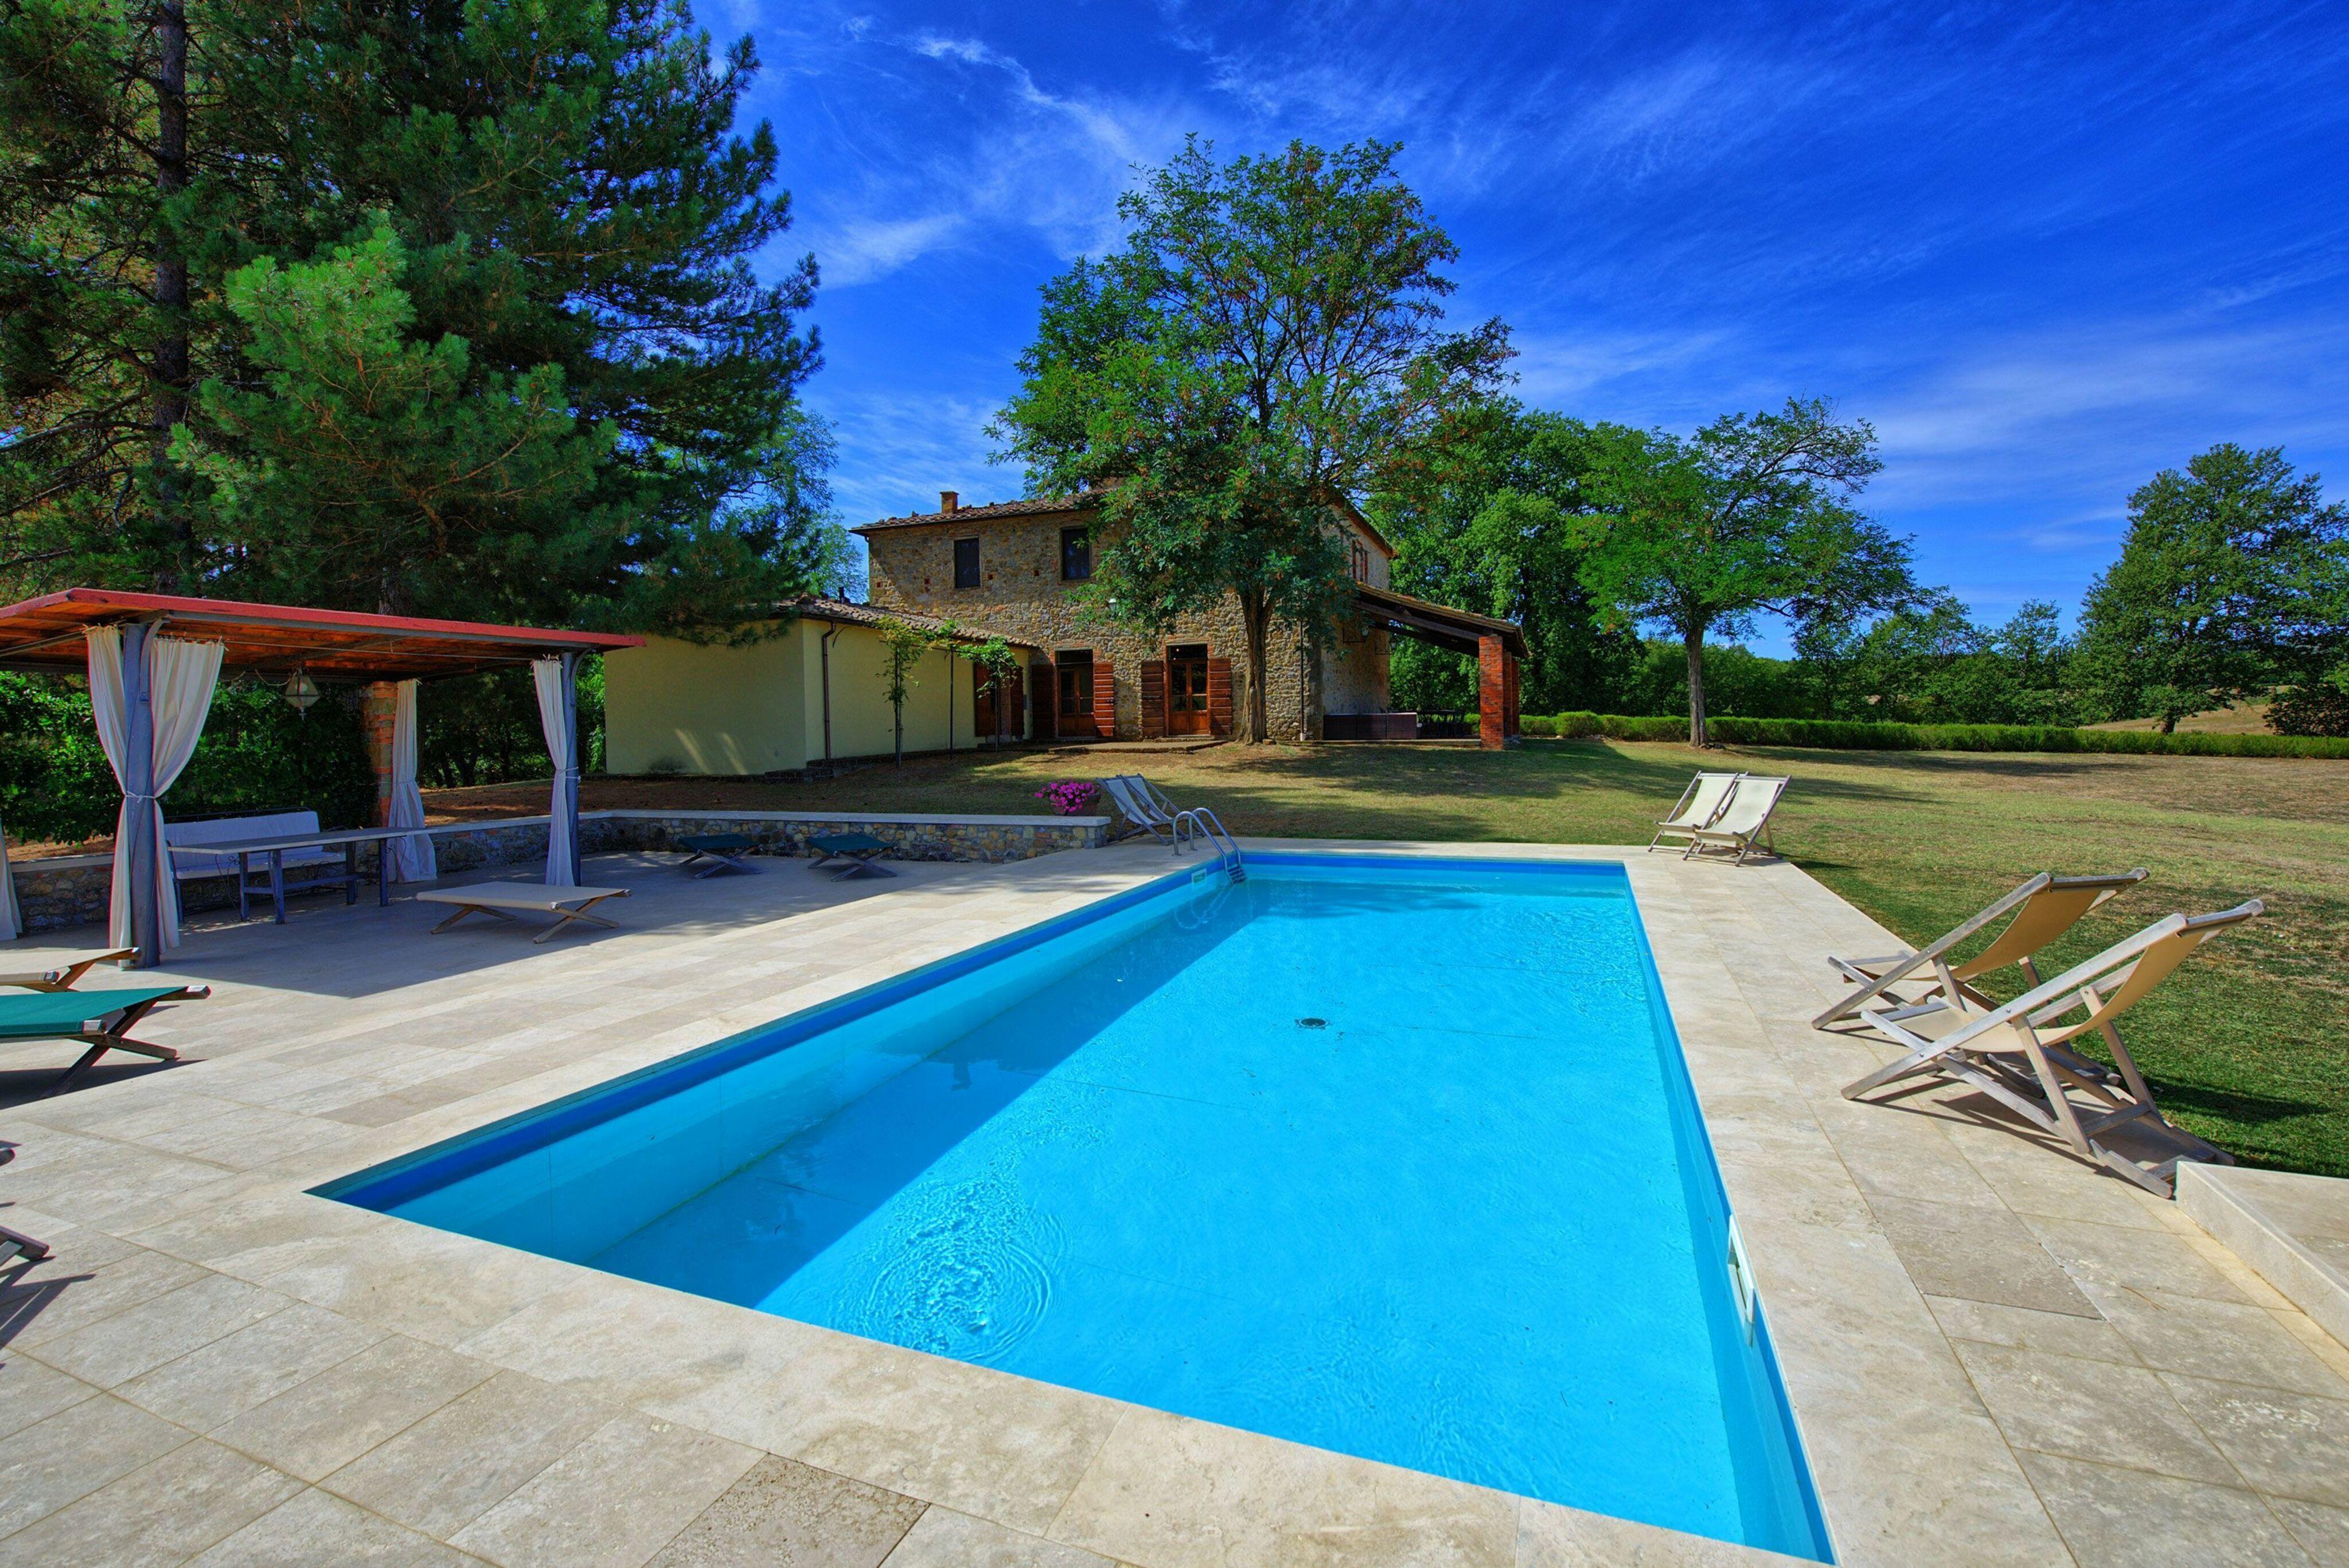 Villa Fabbriimage 42